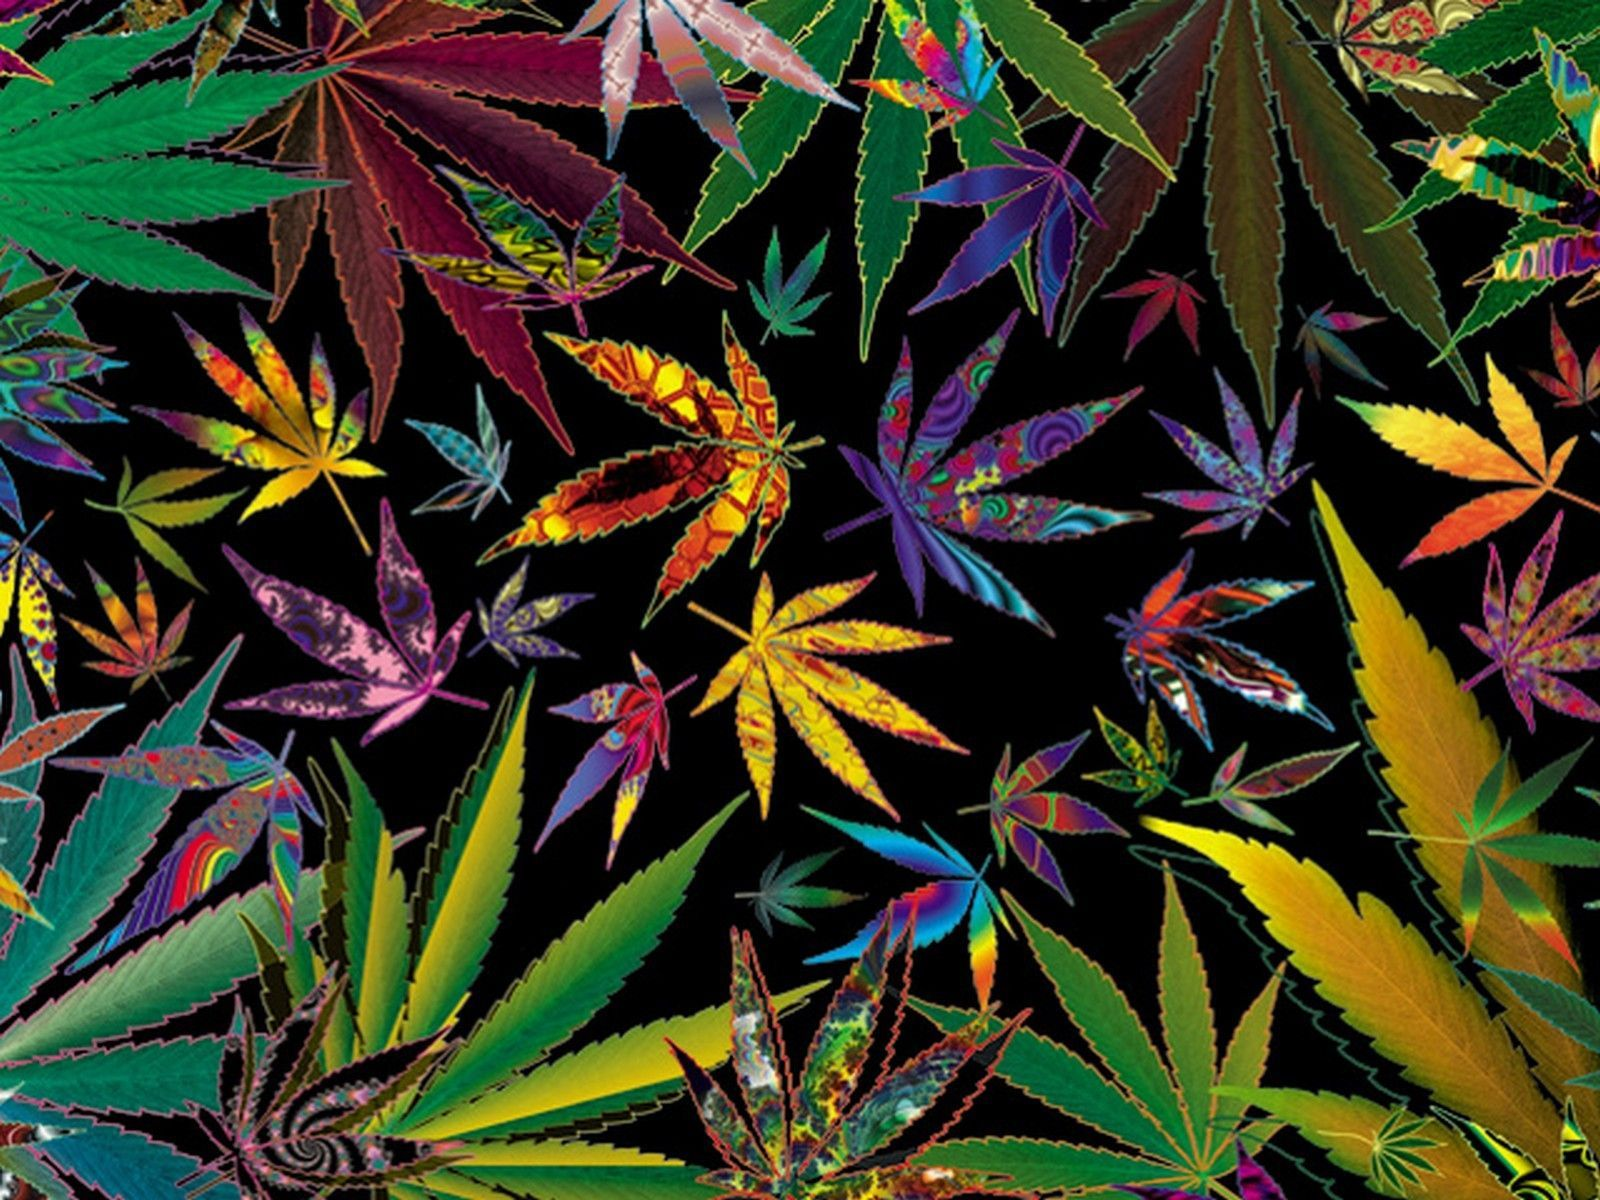 Trippy Marijuana Wallpapers Top Free Trippy Marijuana